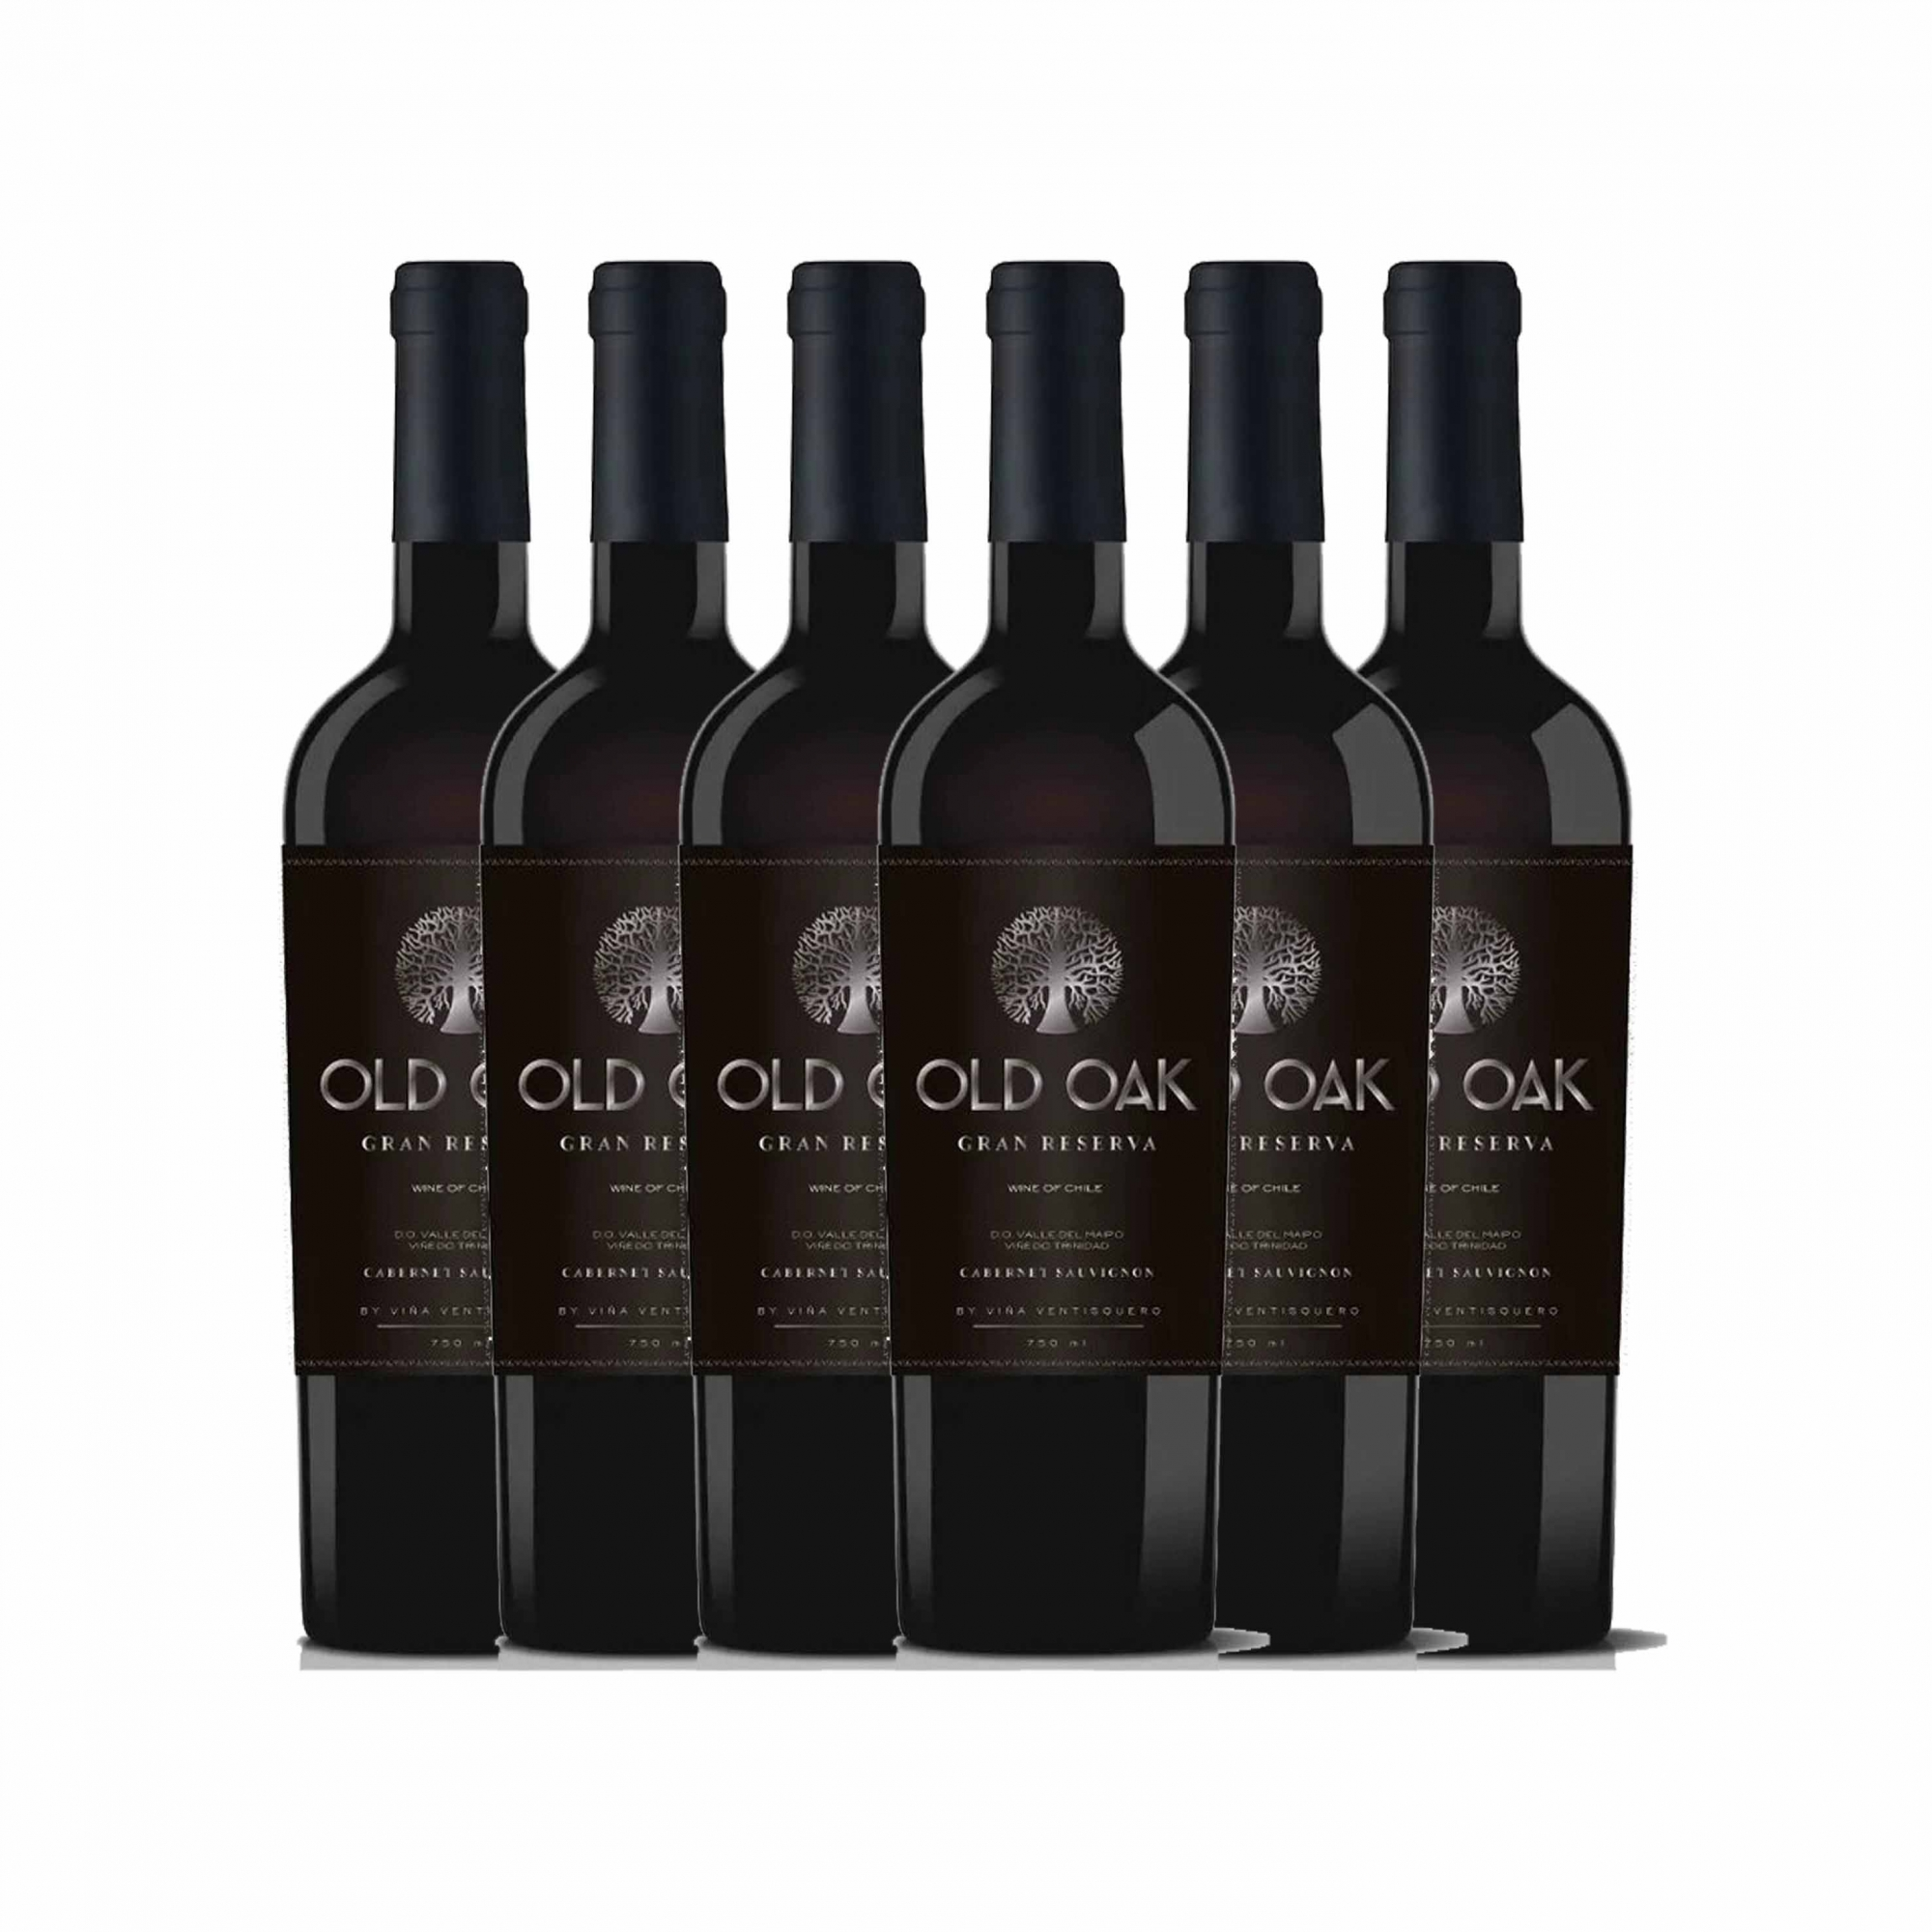 Kit 6x Vinho Tinto Chileno Old Oak Gran Reserve Cabernet Sauvignon 2018